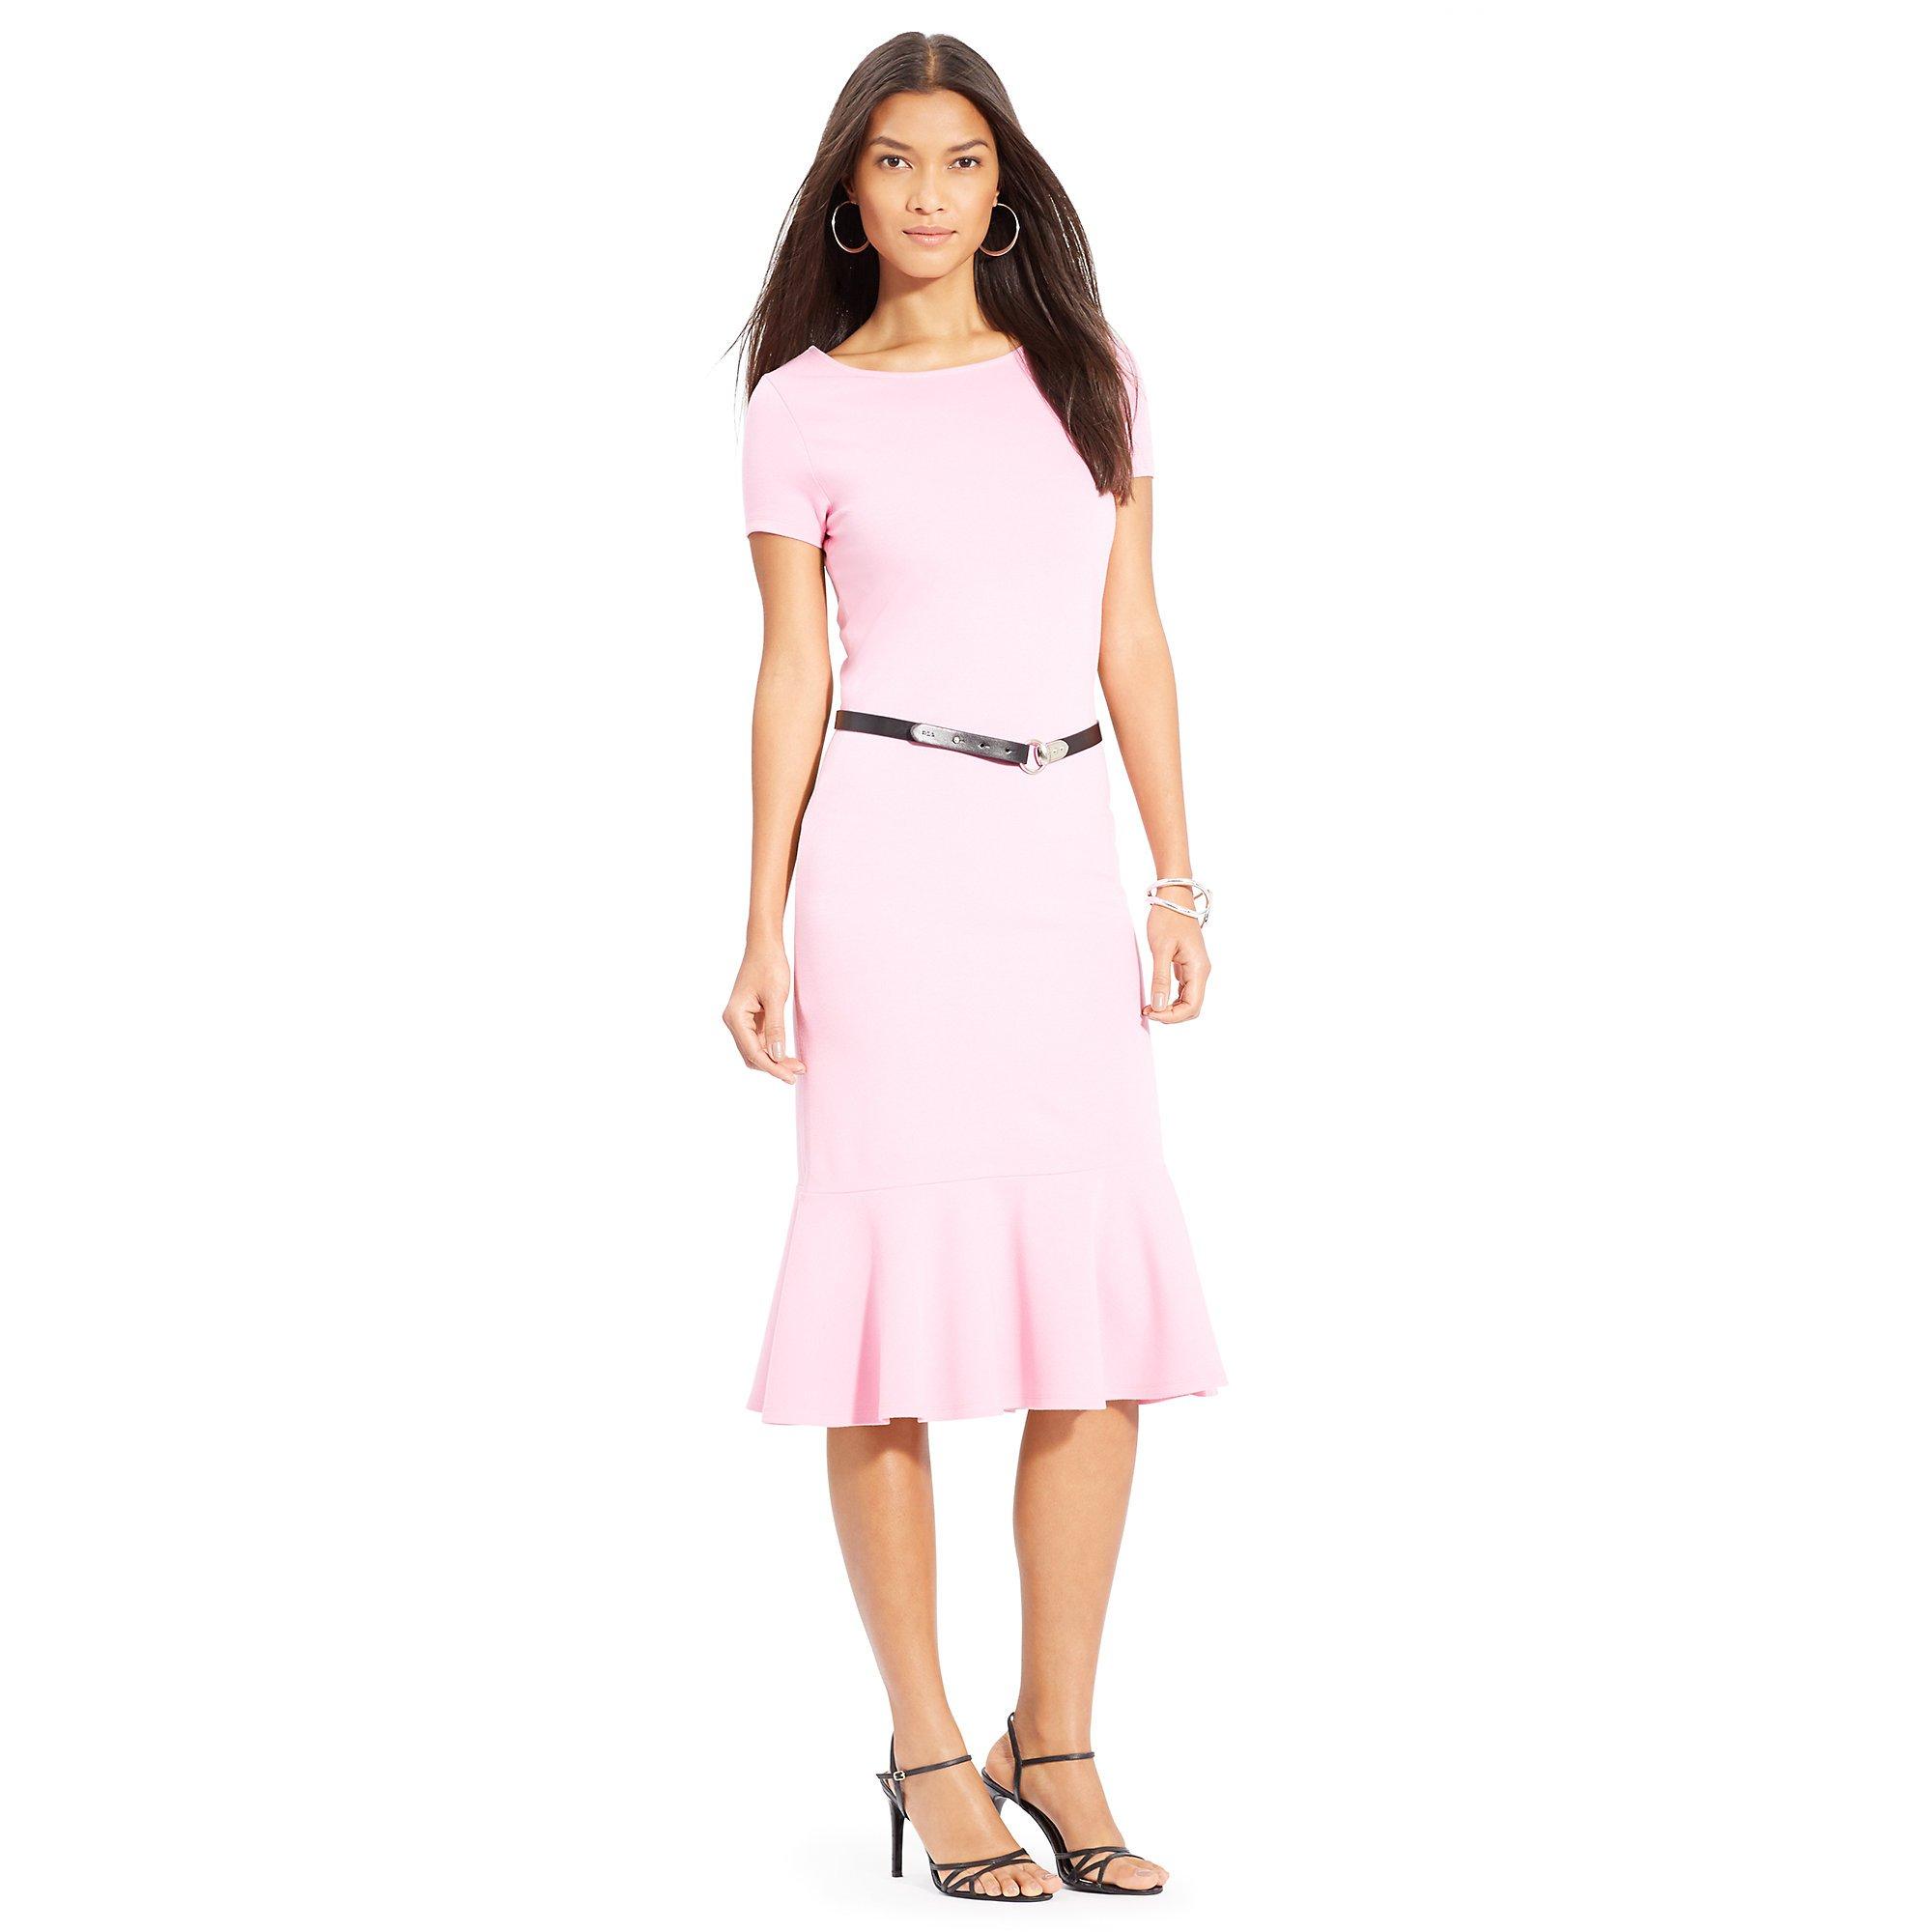 ralph lauren belted ballet neck dress in pink garden pink lyst. Black Bedroom Furniture Sets. Home Design Ideas